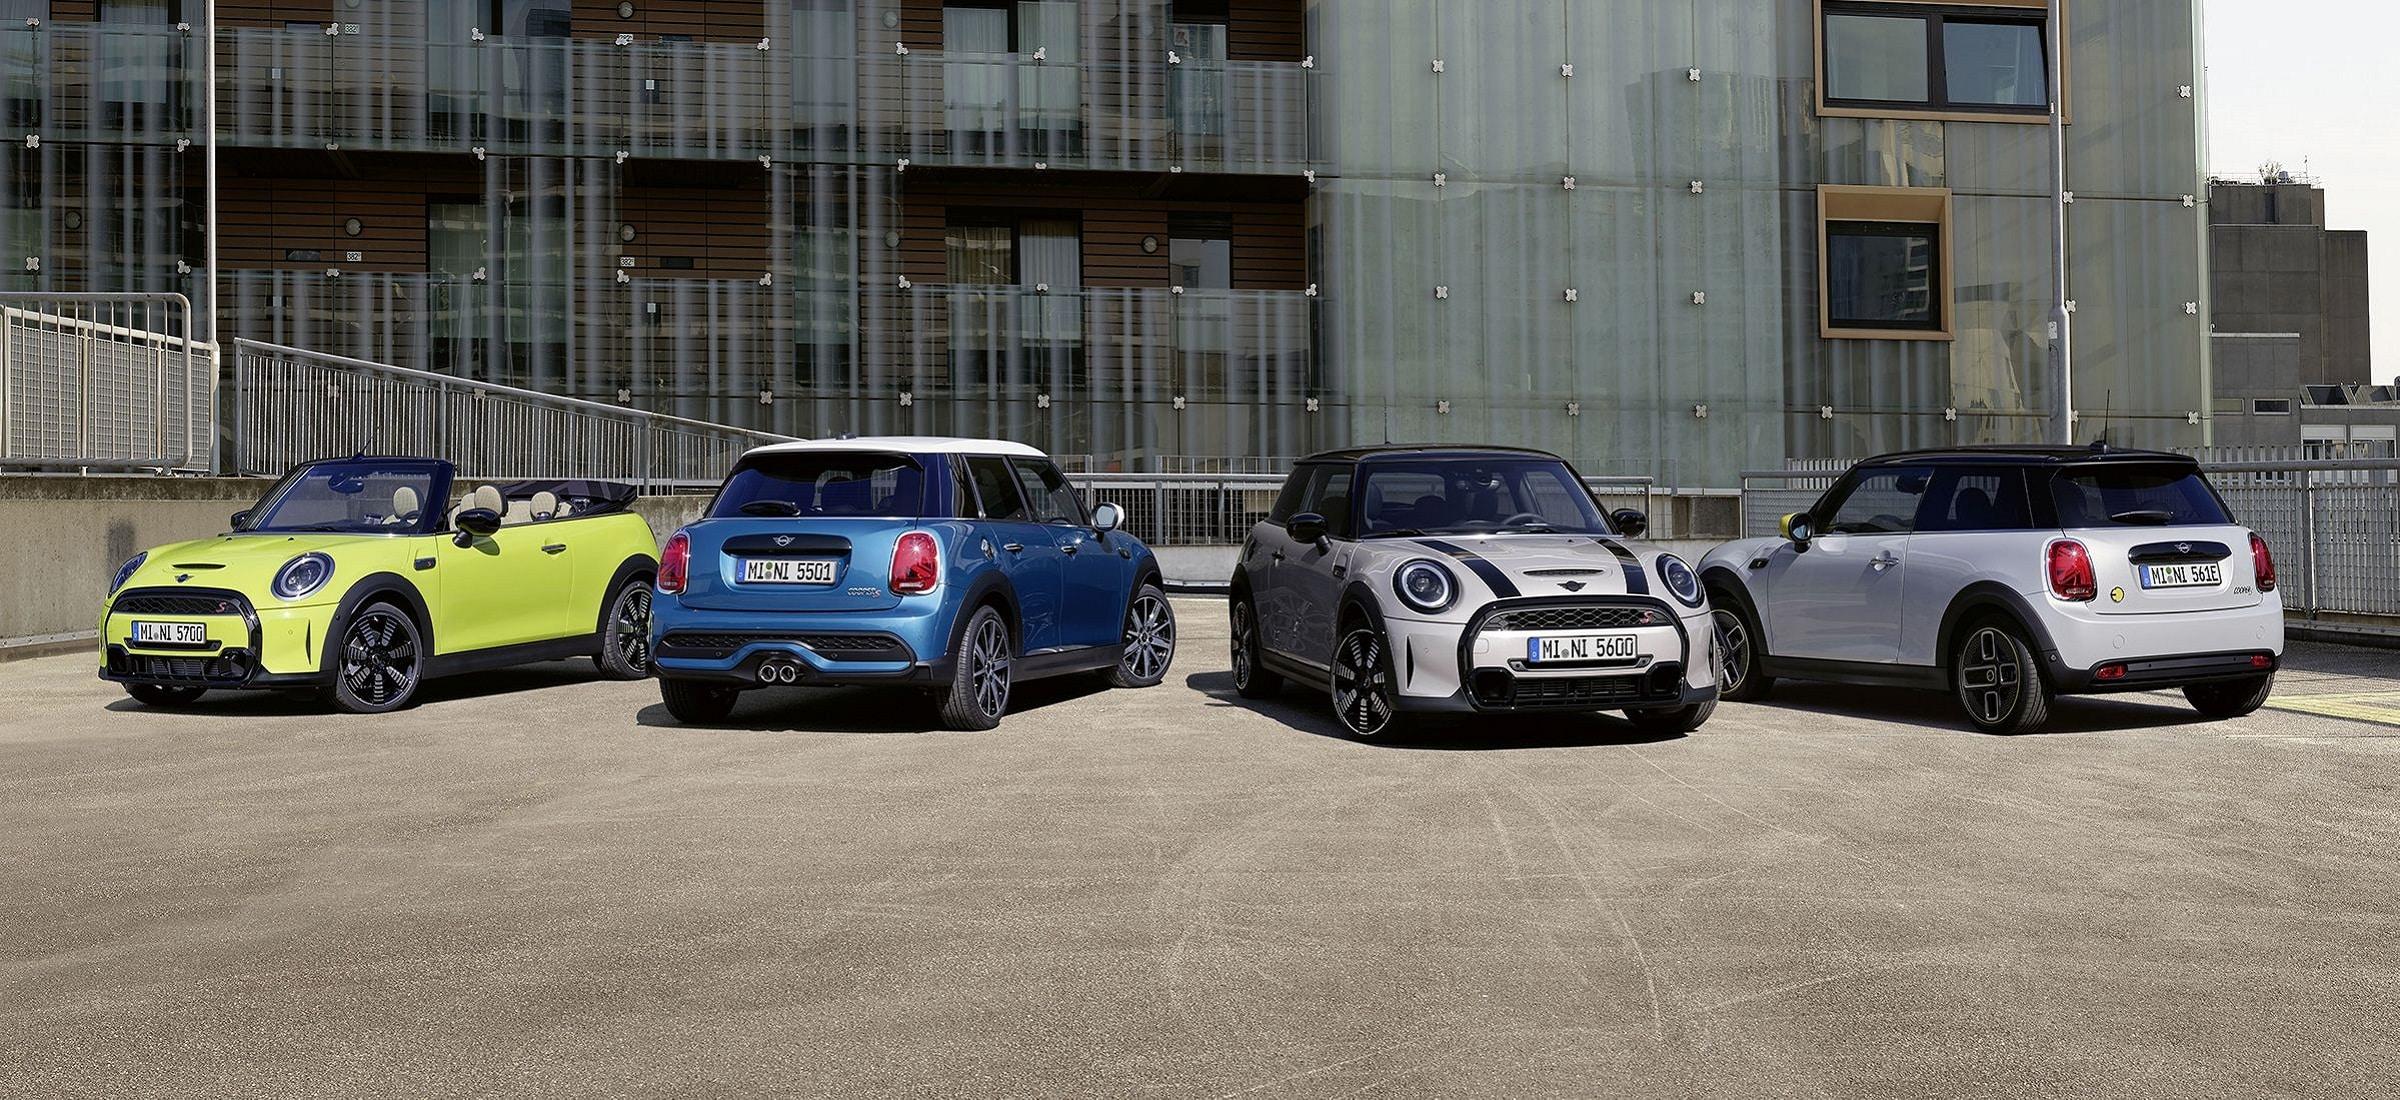 Der neue MINI 3-Türer, der MINI 5-Türer, das MINI Cabrio, der MINI Cooper SE.